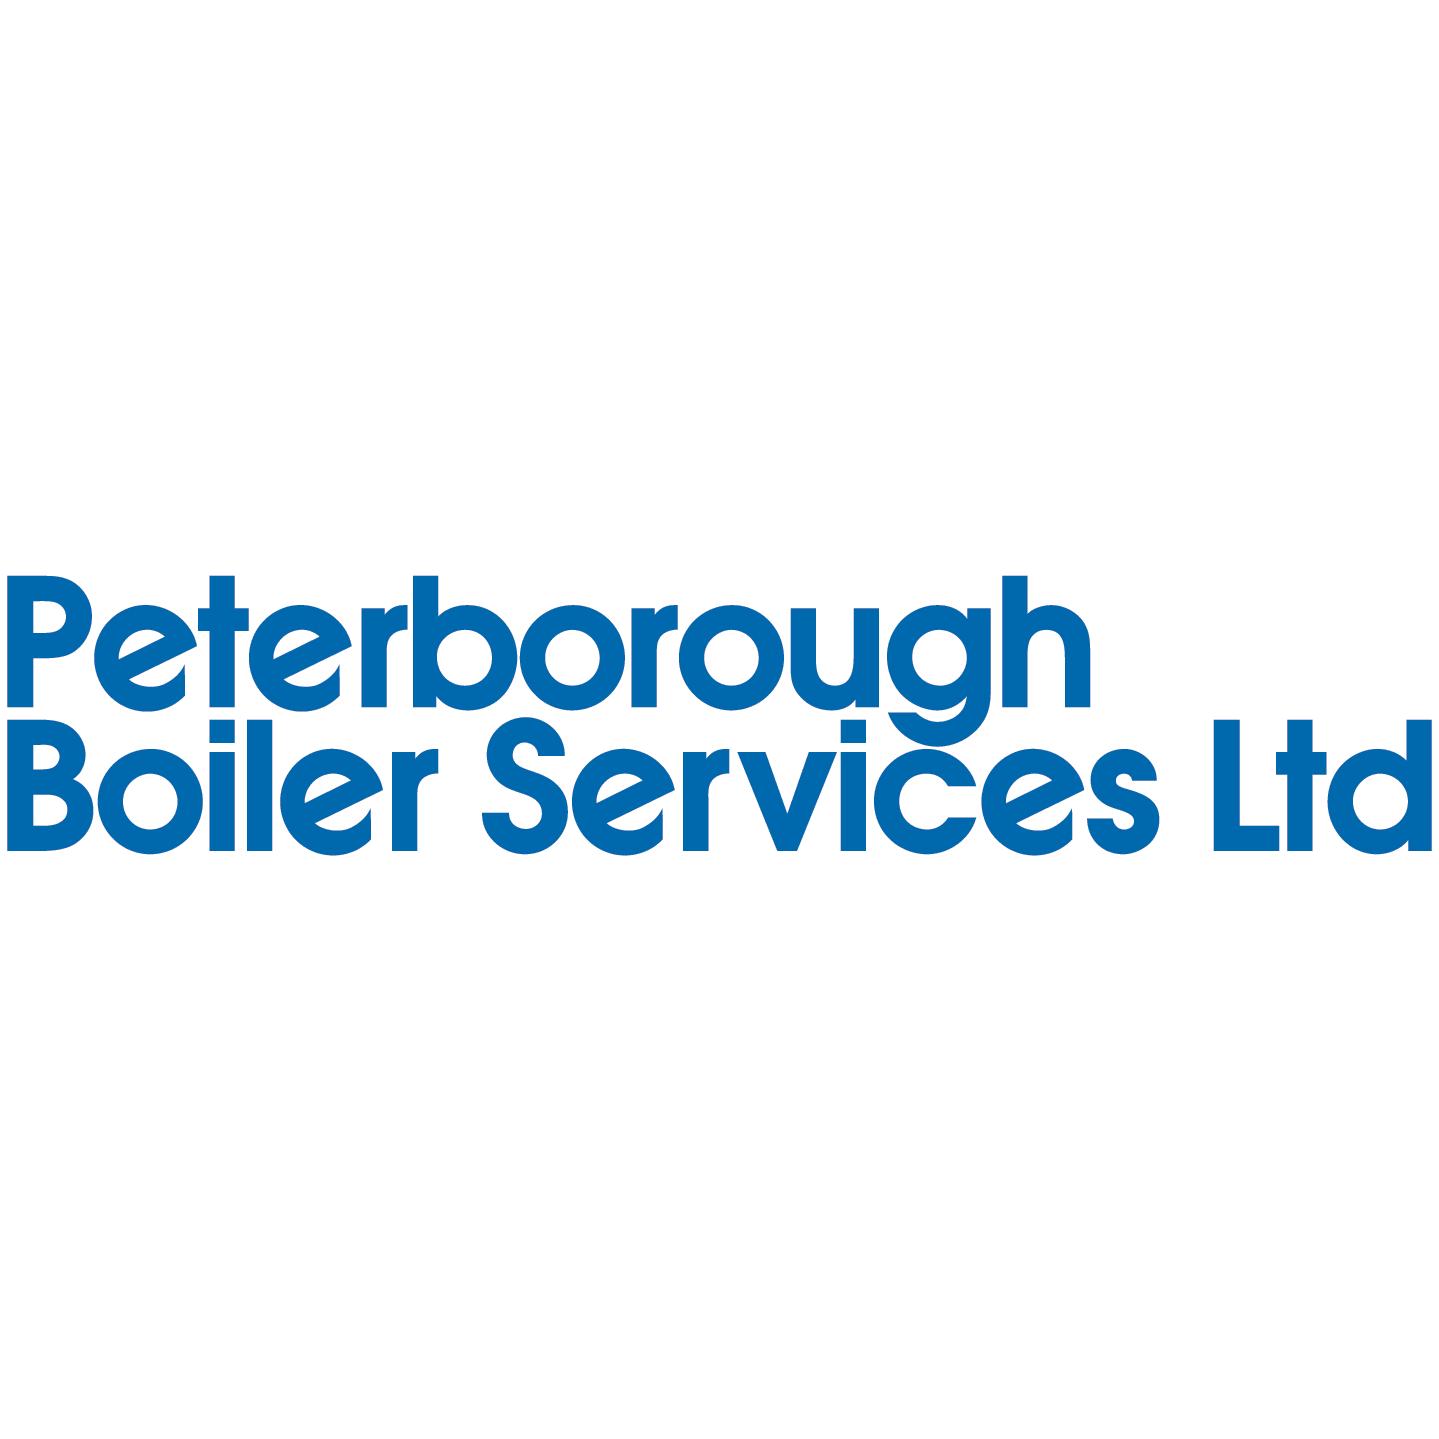 Peterborough Boiler Services Ltd - Peterborough, Cambridgeshire PE2 7EF - 01733 312586 | ShowMeLocal.com